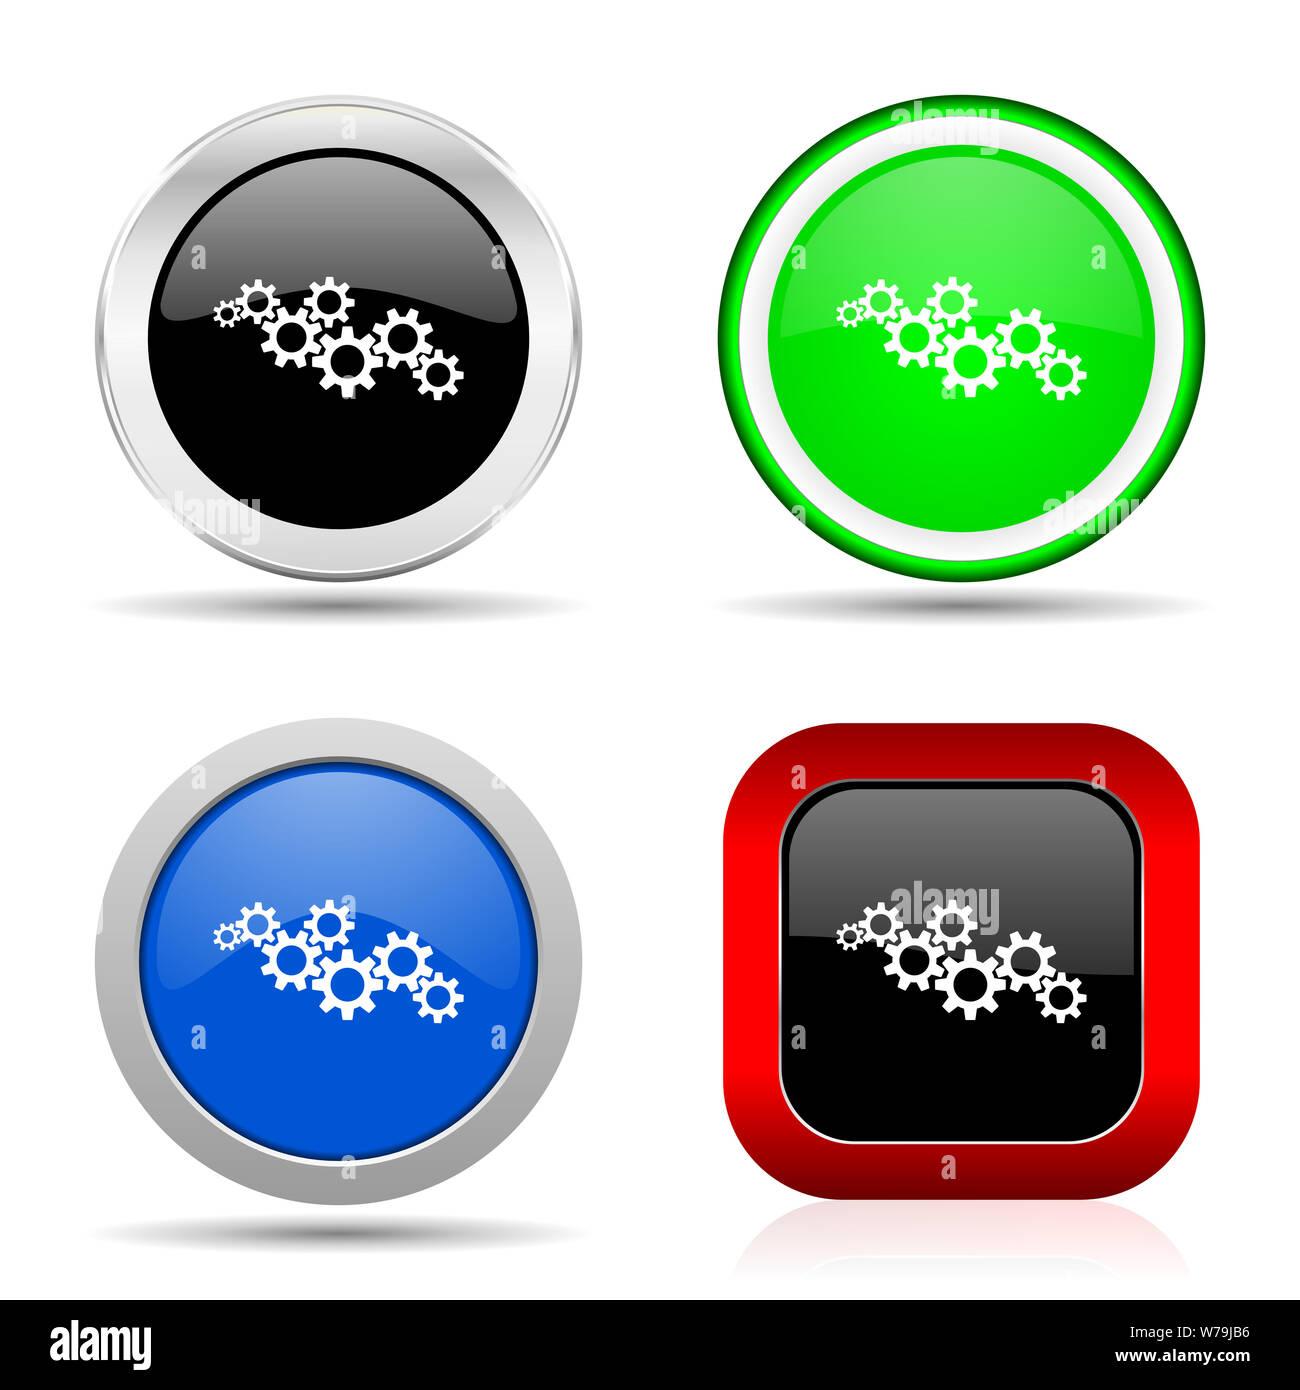 Cog Icon Black Stock Photos & Cog Icon Black Stock Images